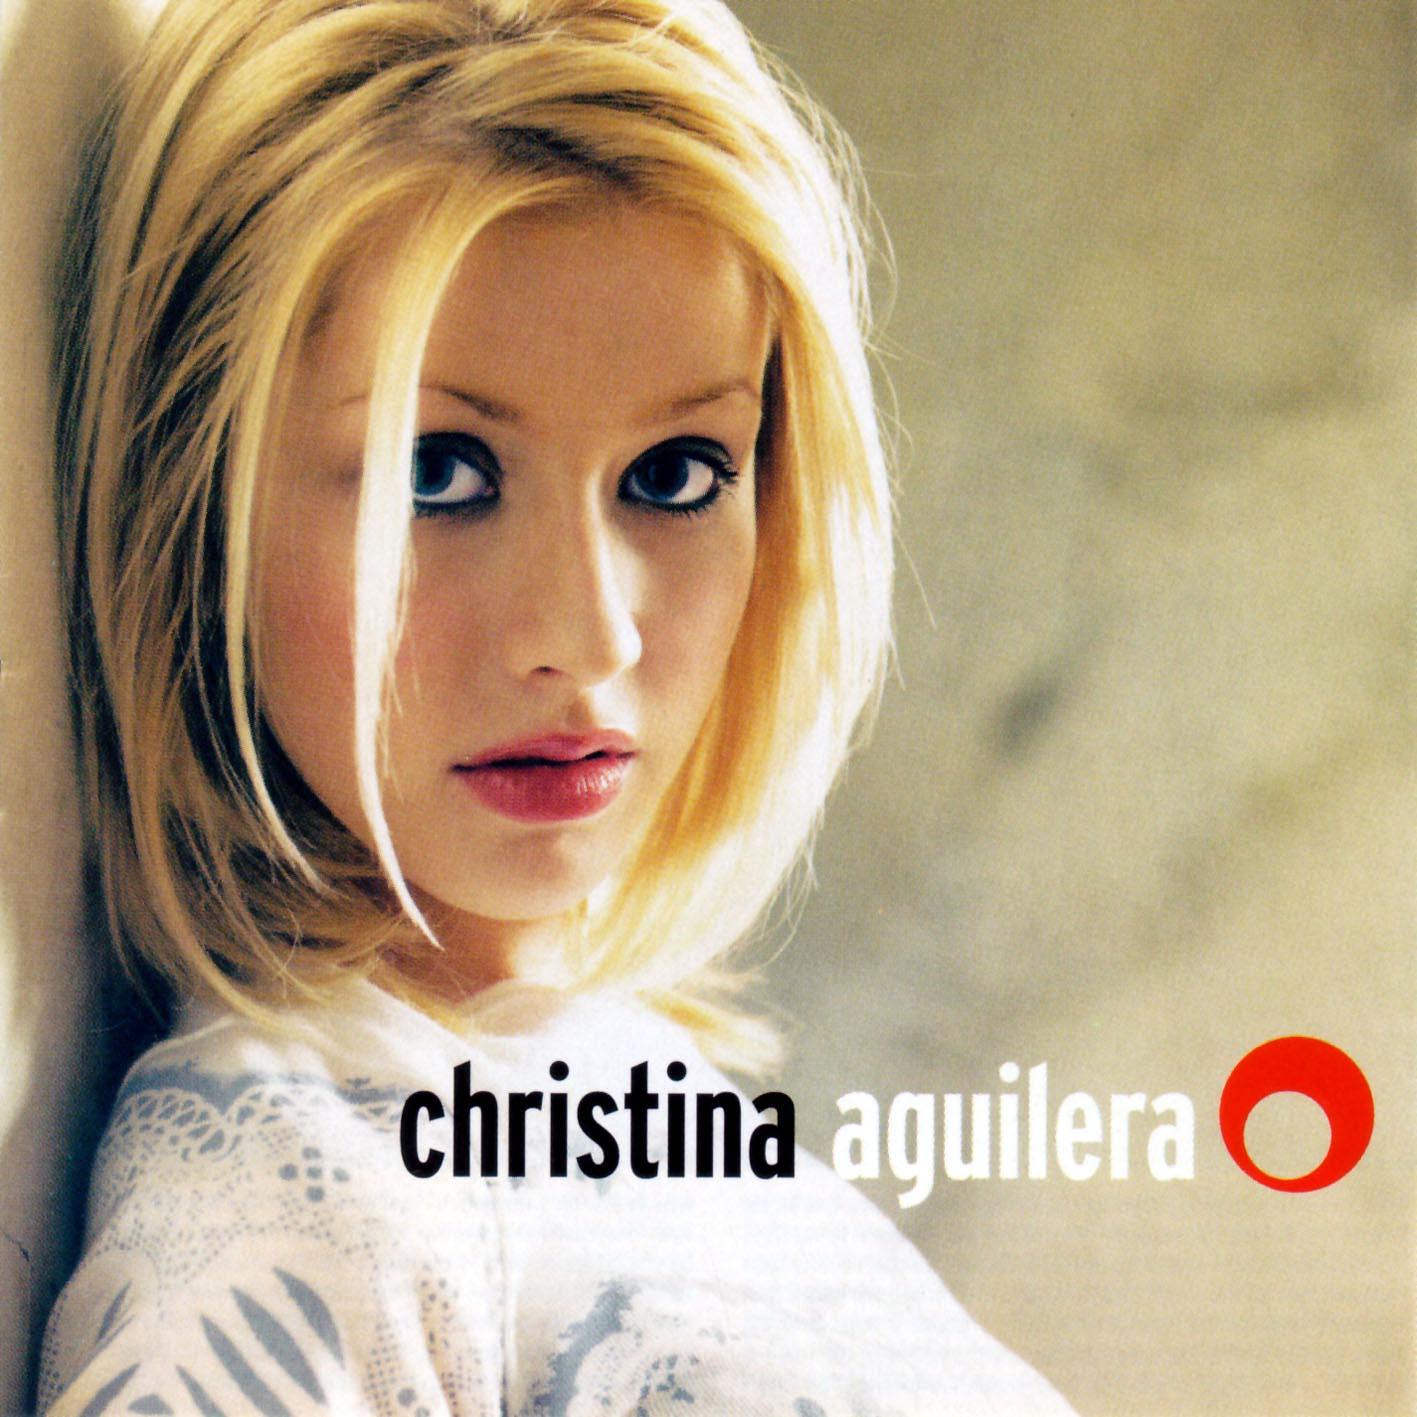 Cristina Aguilera Teen 118